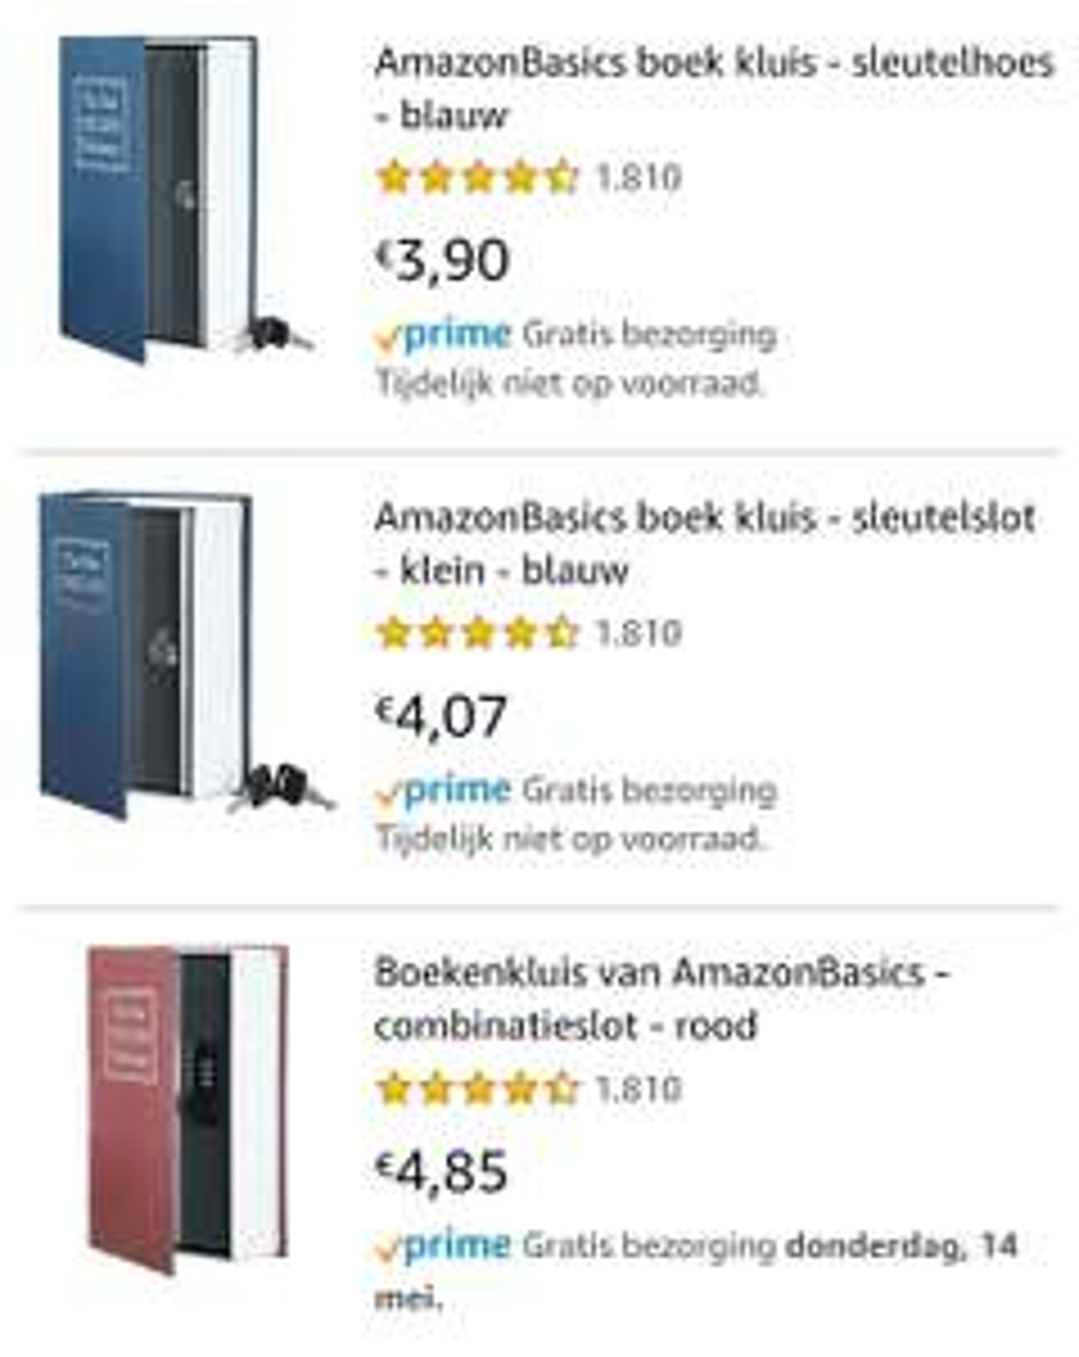 Boek kluis v.a. €3,90 @ Amazon.nl